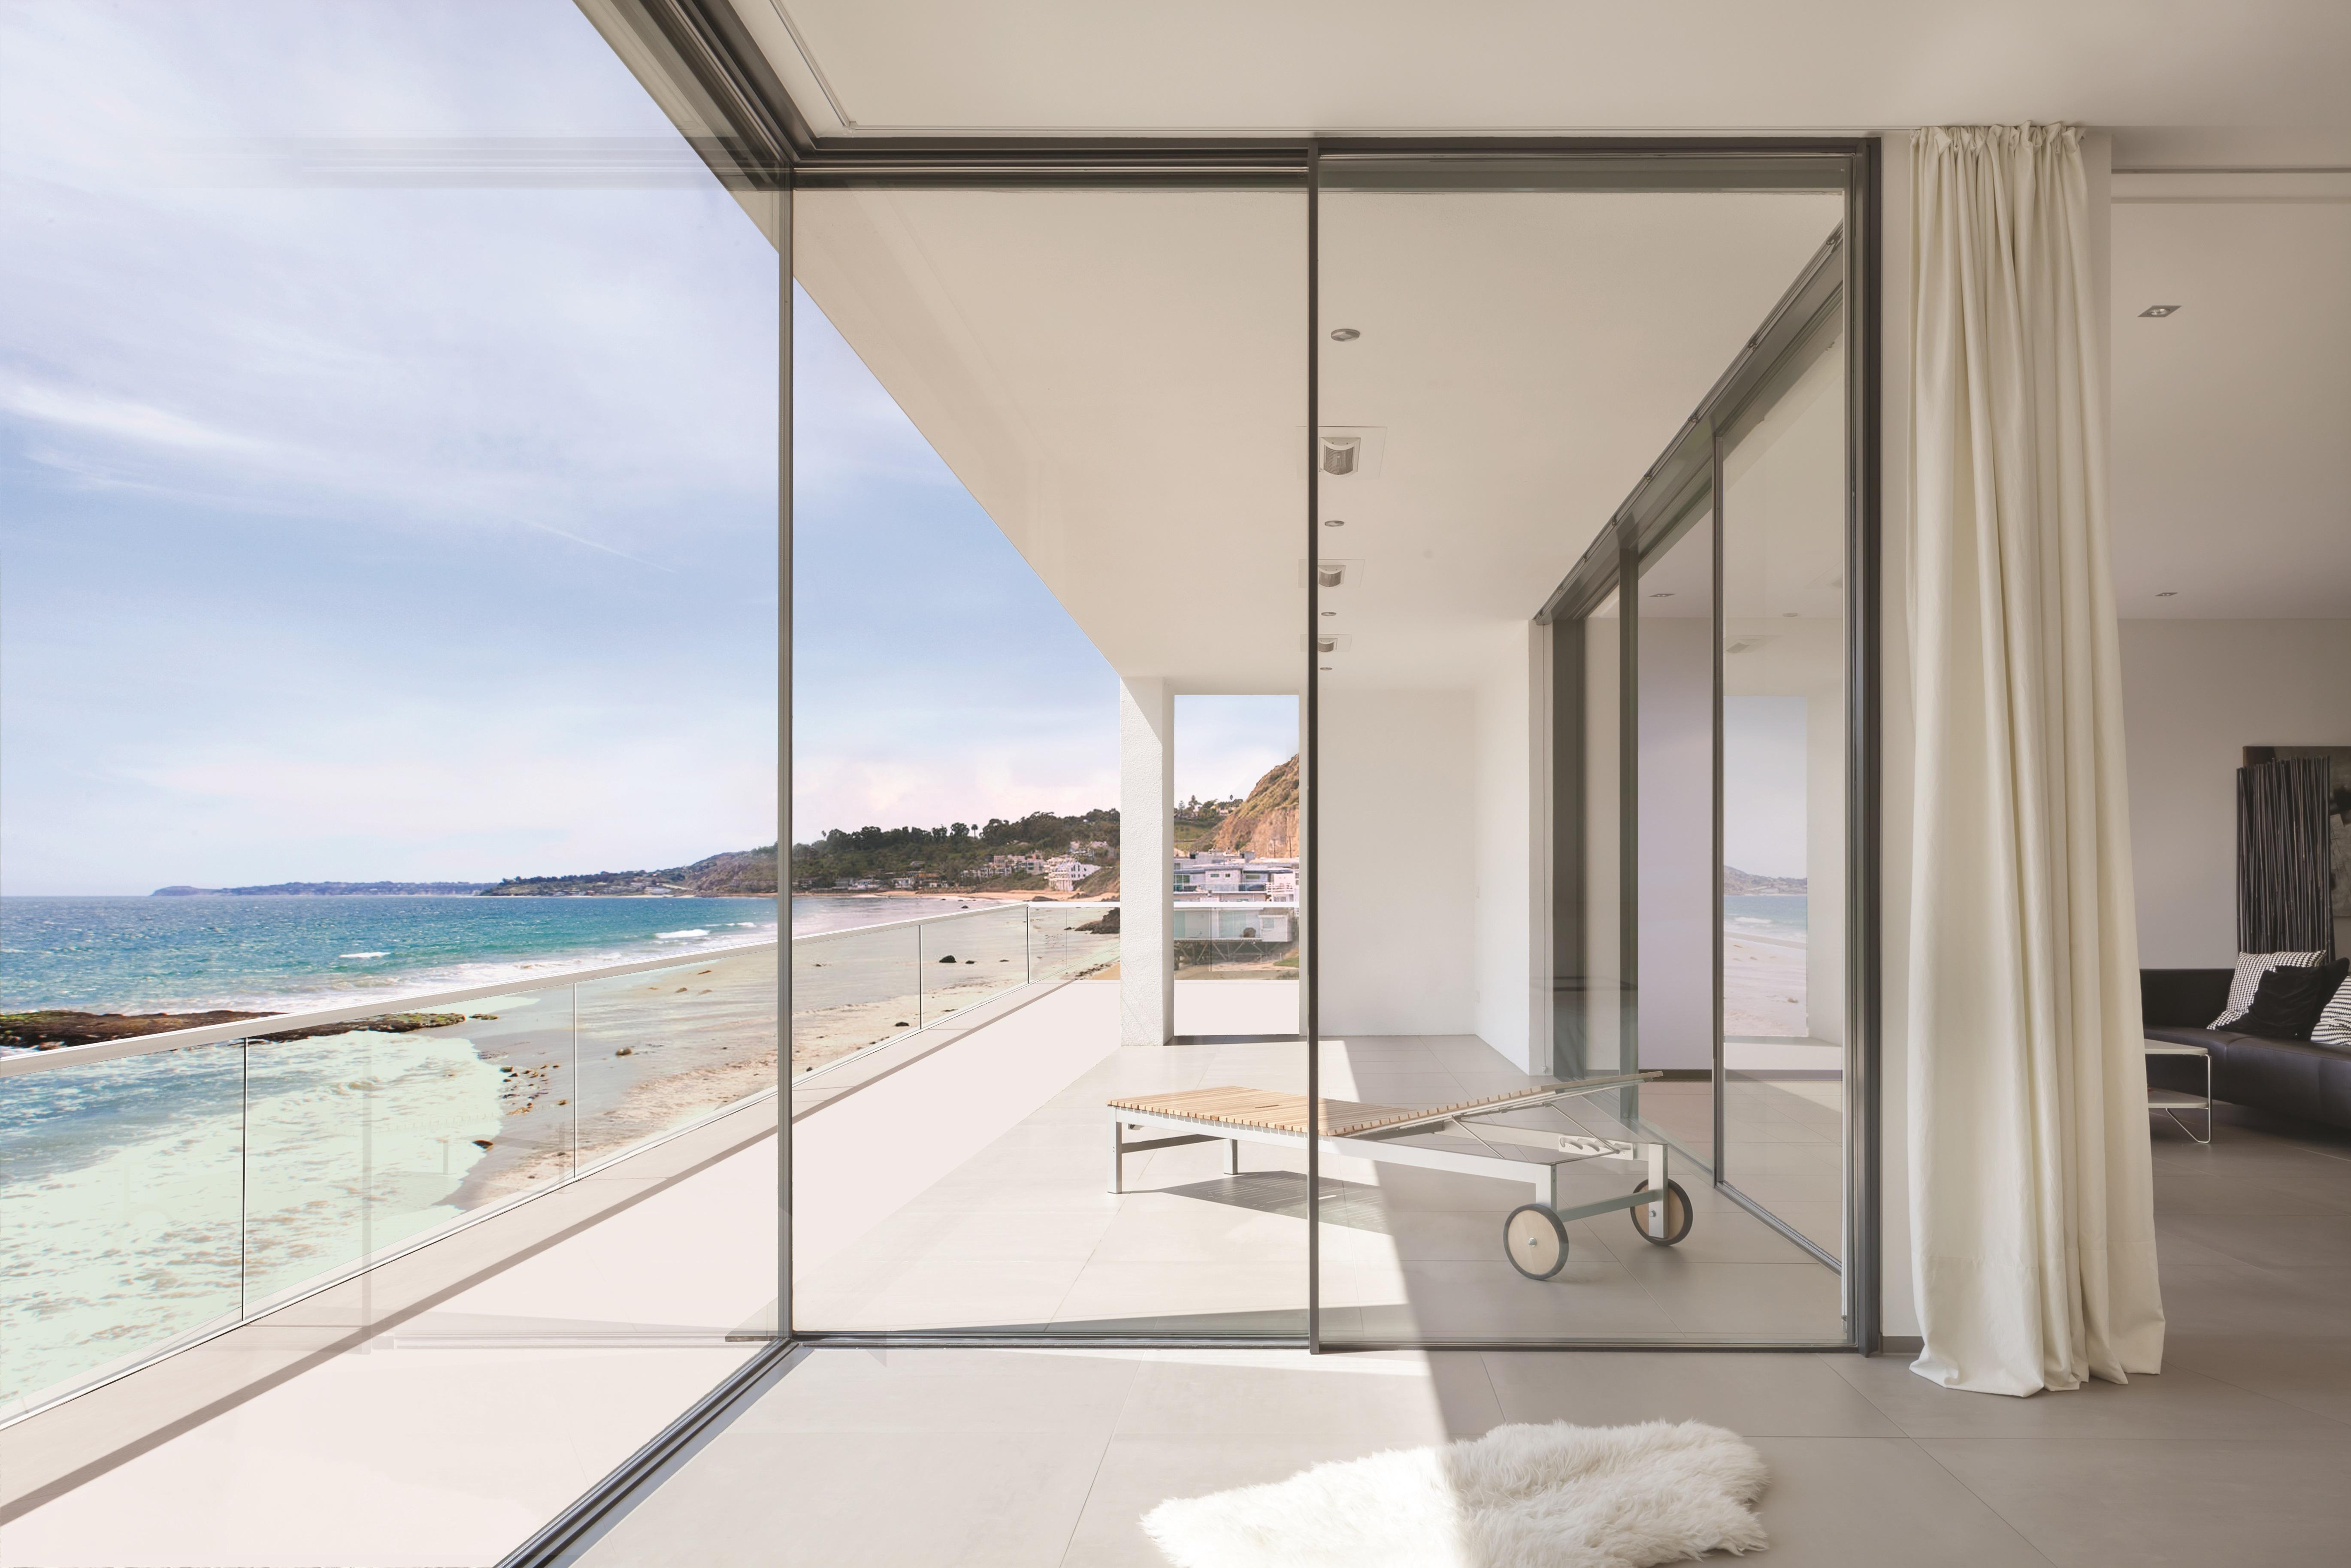 Minimal framed sliding glass wall system for residential pro for Sliding window wall